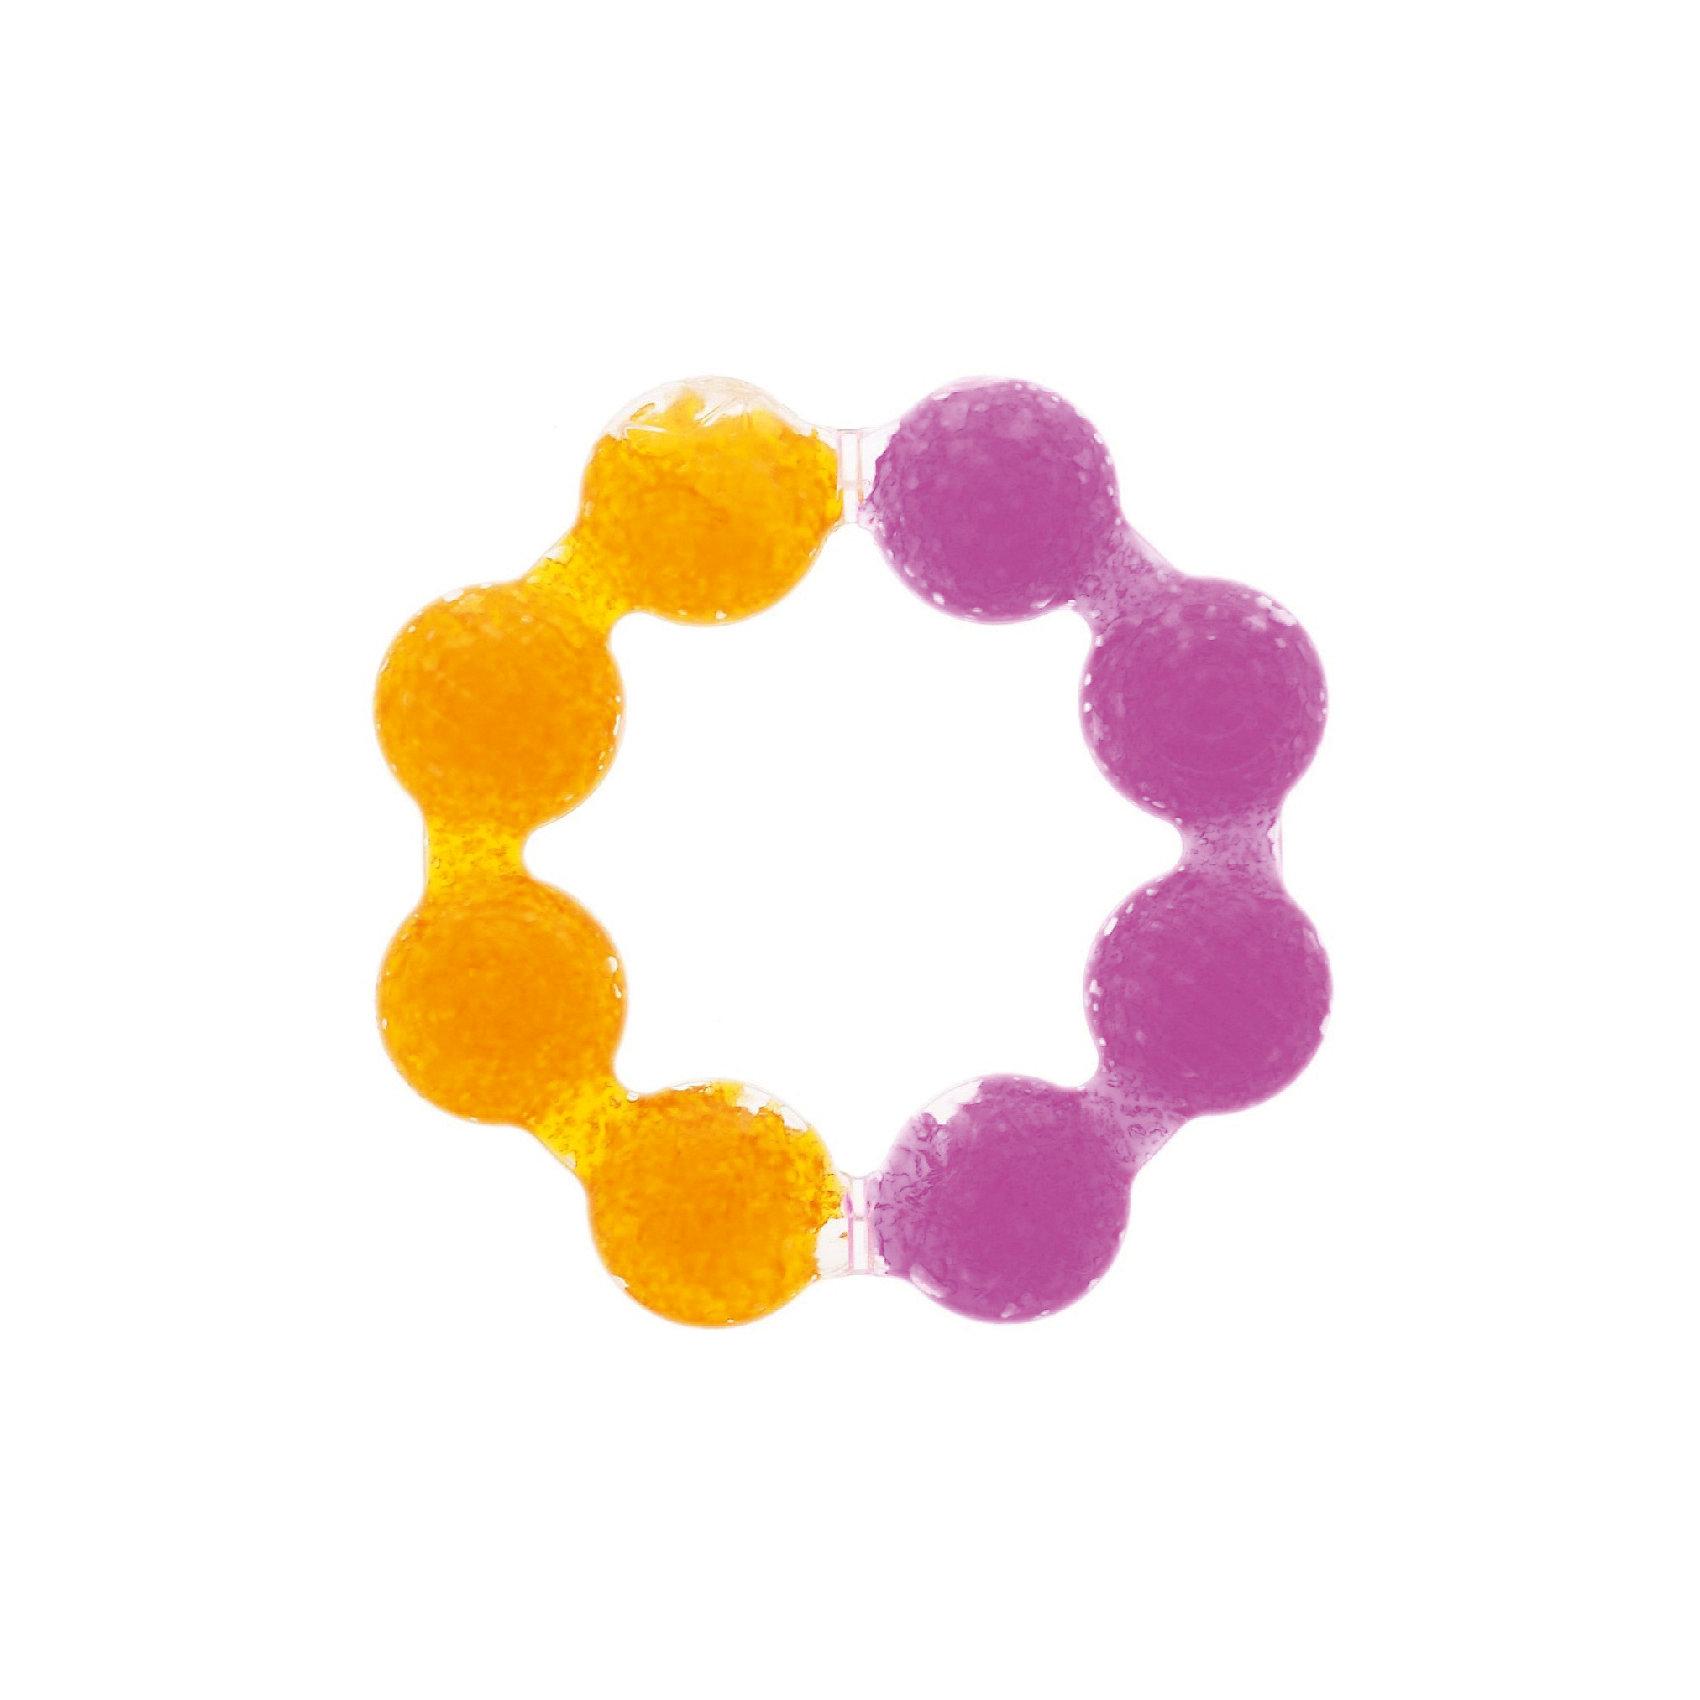 munchkin Игрушка  прорезыватель Цветок , Munchkin, рыжий-розовый munchkin игрушка прорезыватель мячик